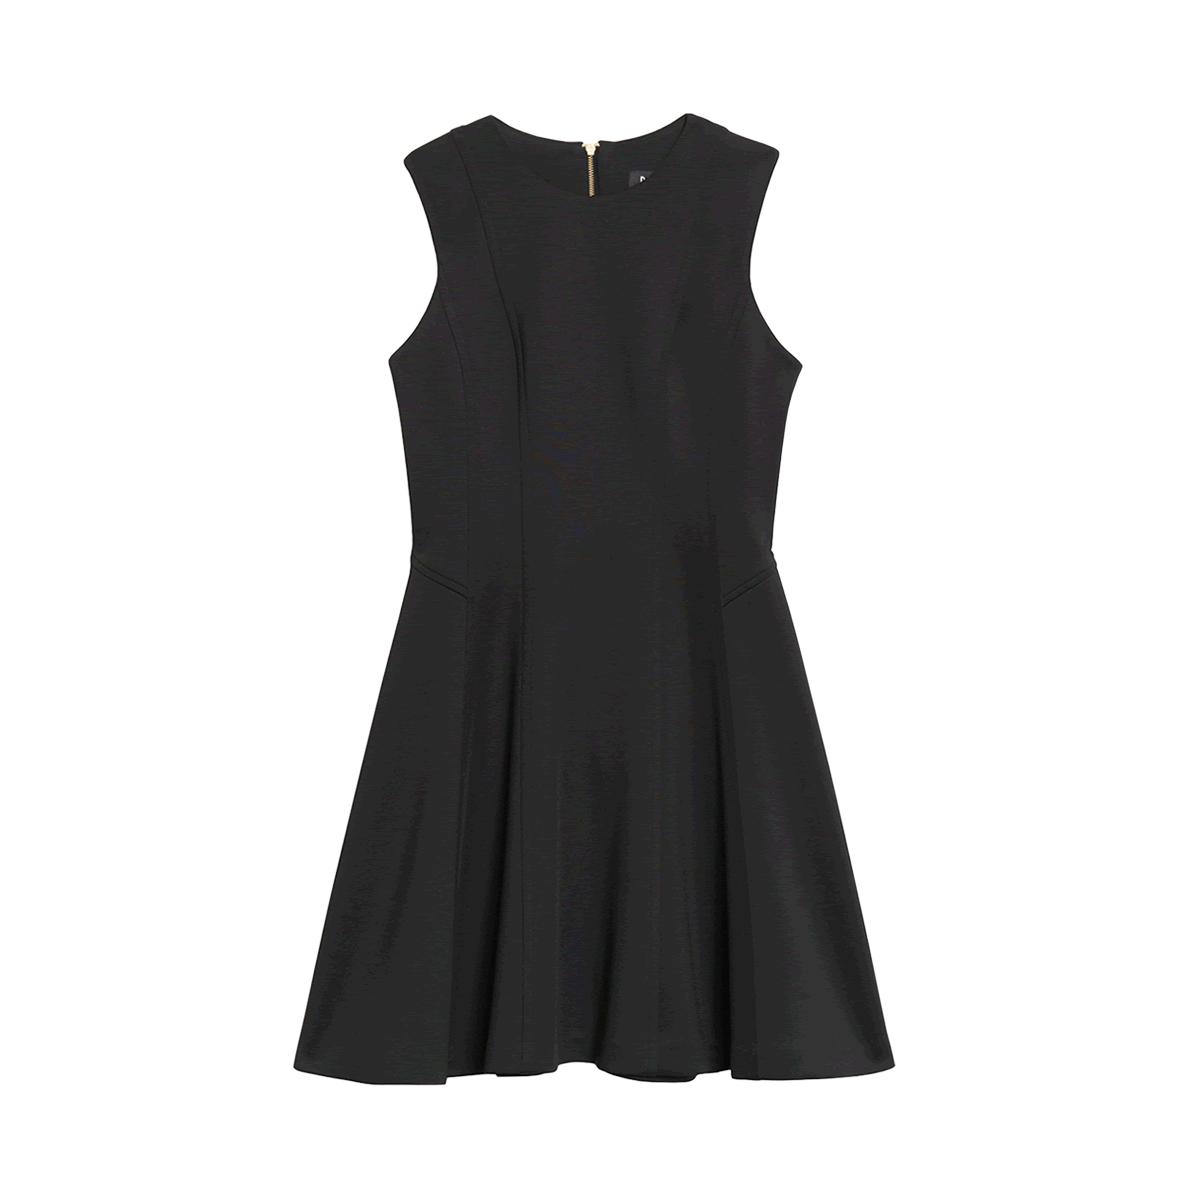 DKNY Dresses & Clothing for Women - Macy\'s